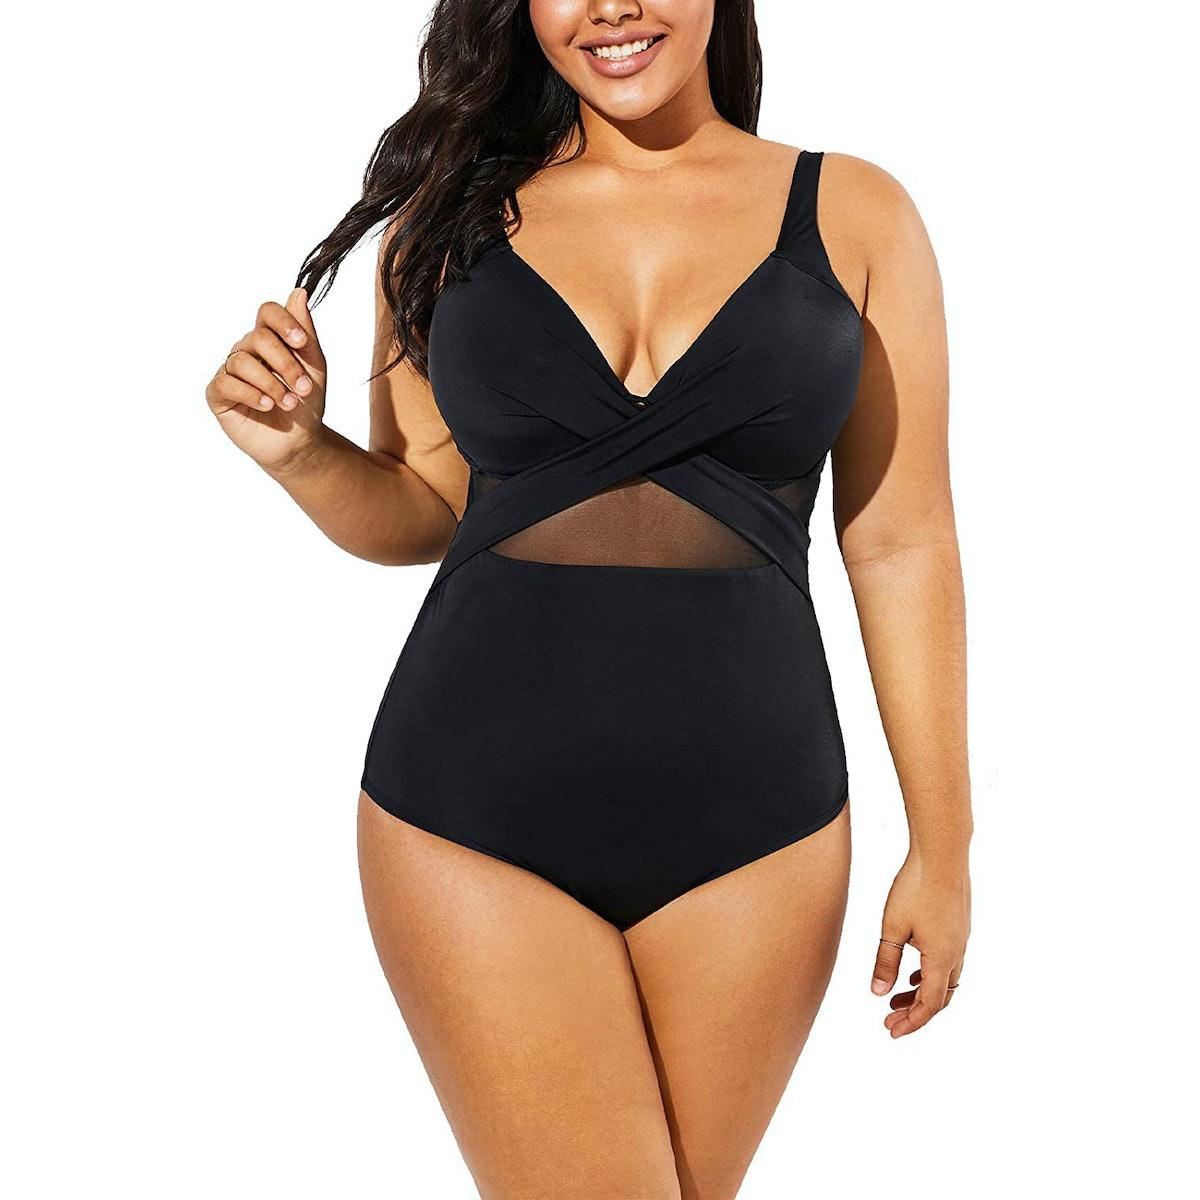 Meet.Curve Plus Size Cut Out Underwire One Piece Swimsuit